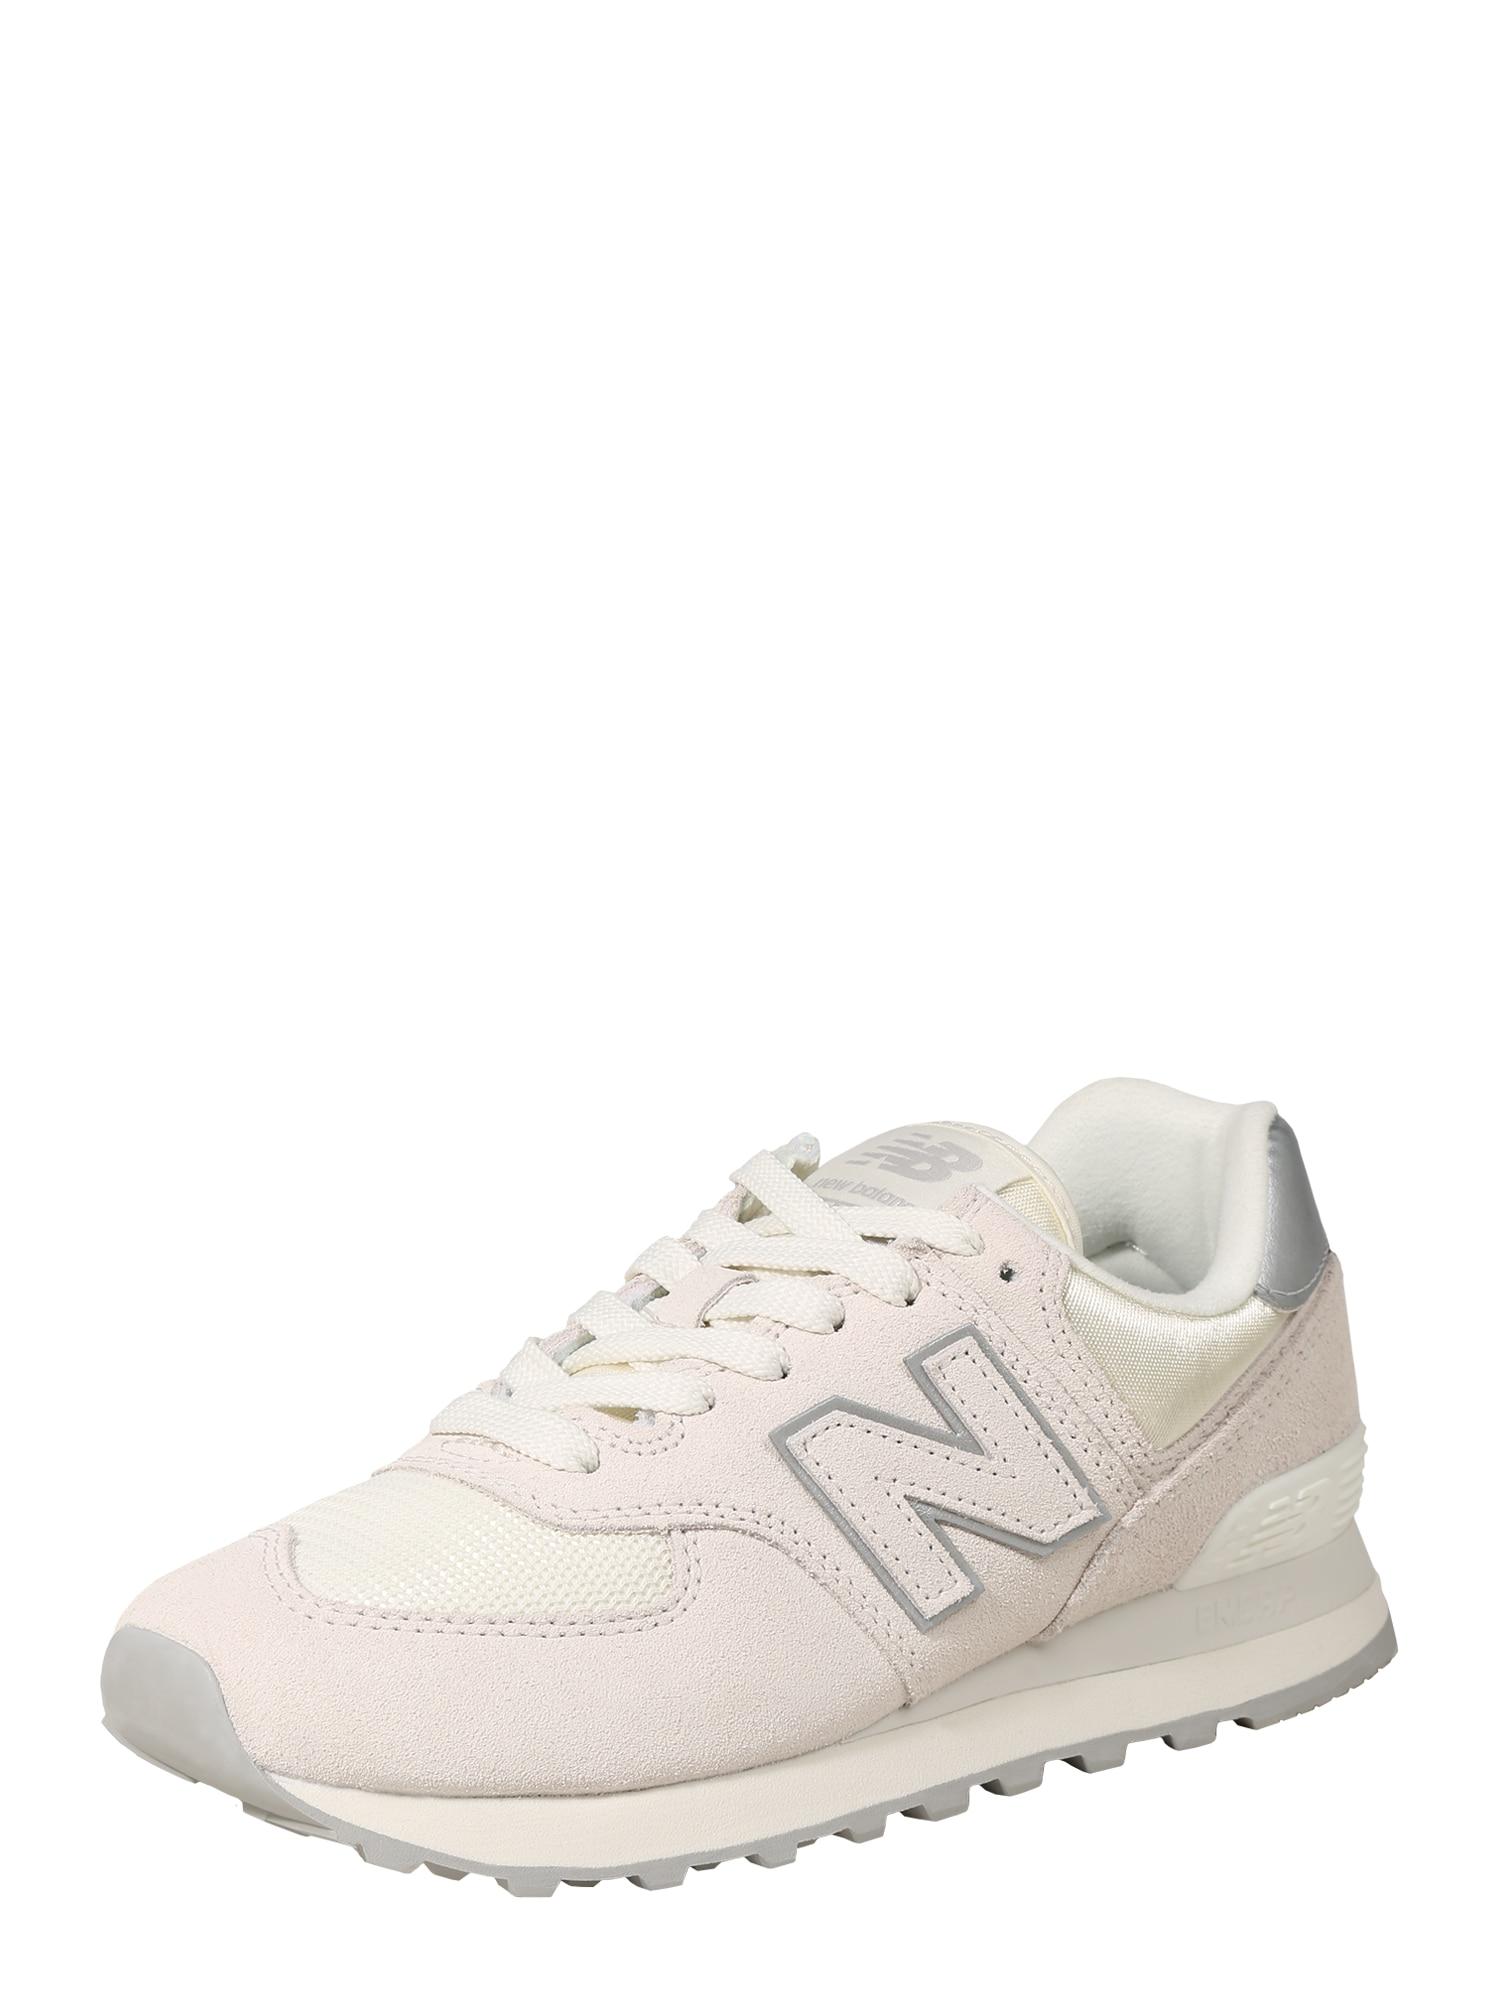 Tenisky bílá offwhite New Balance